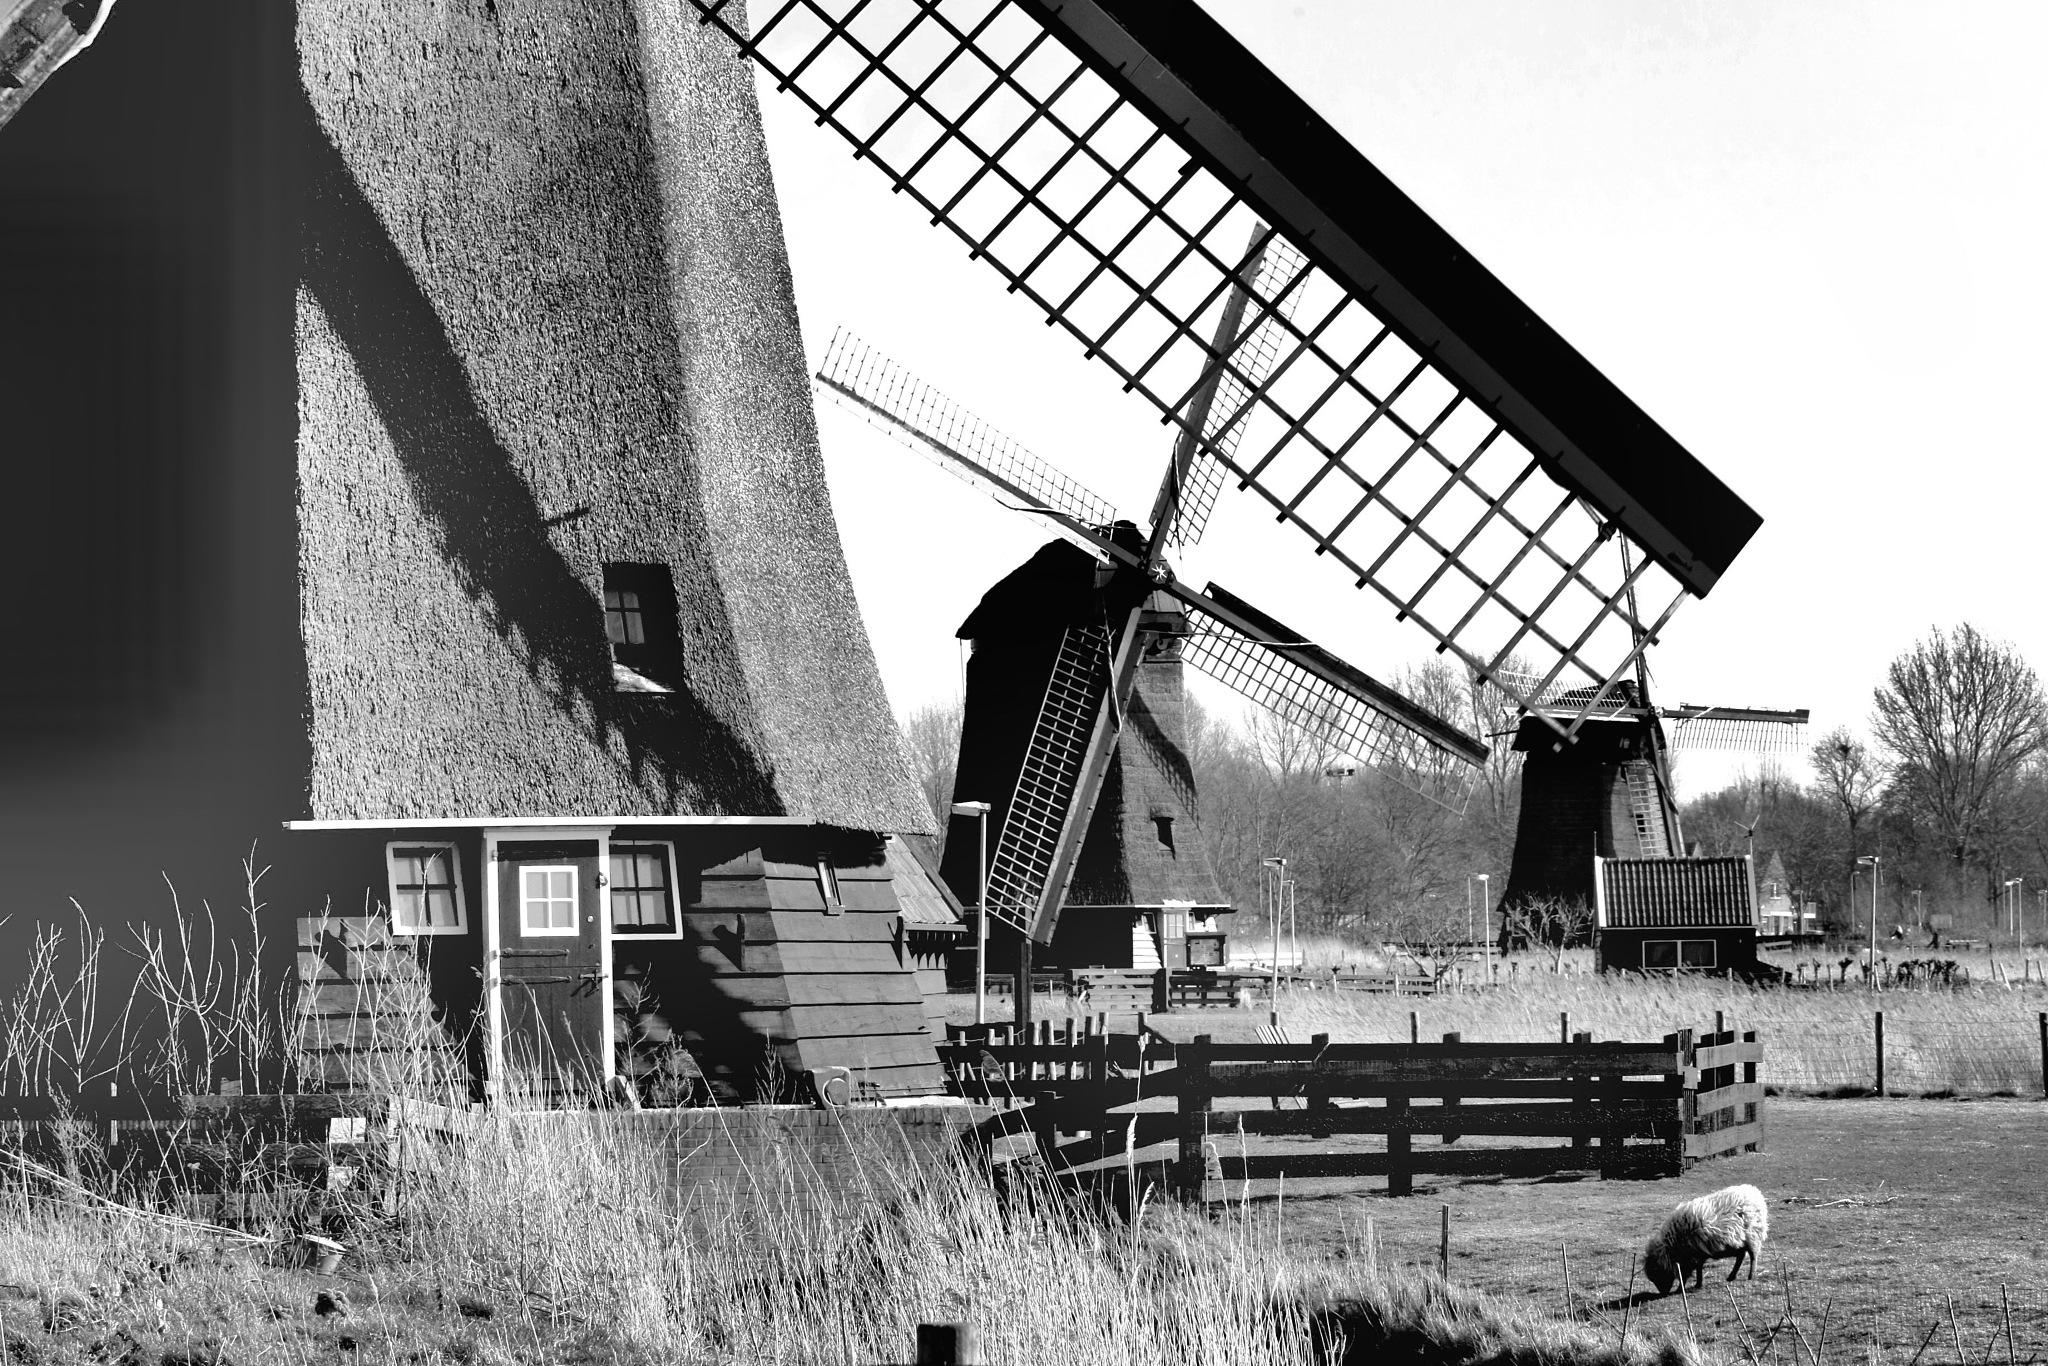 Windmills at Alkmaar-Holland in b&w by Bob66